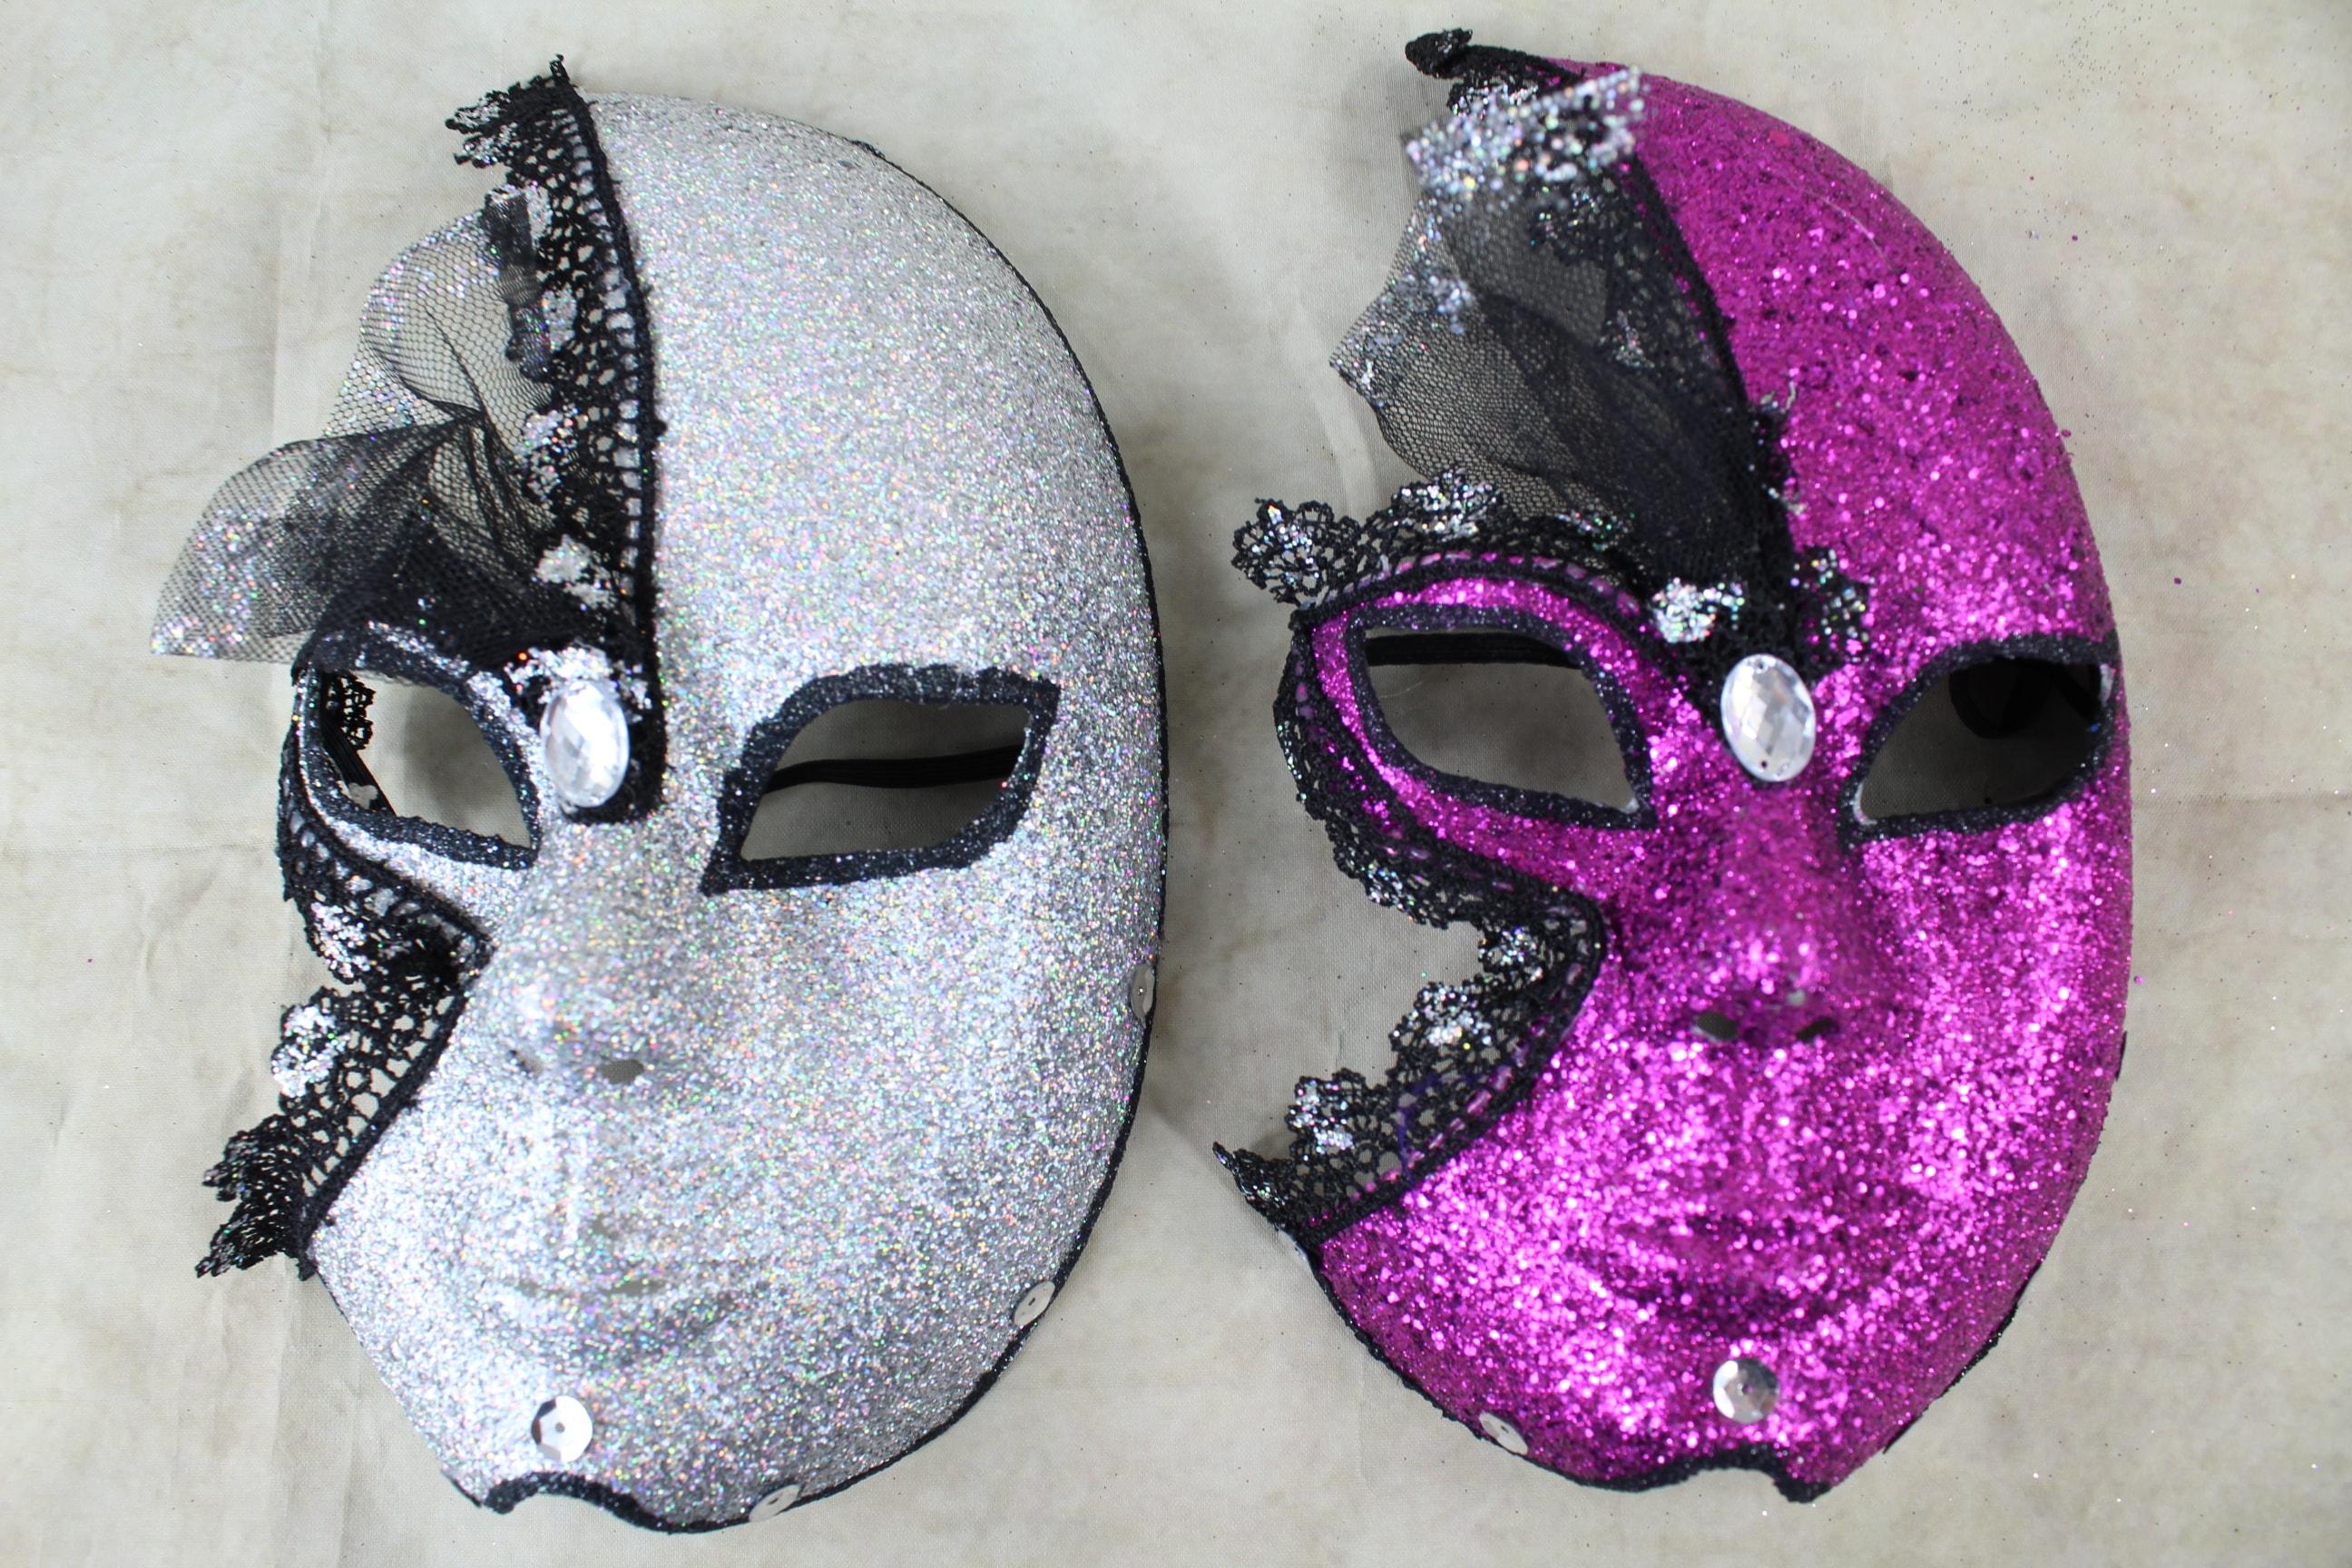 10 x Full Face Decoration Masks